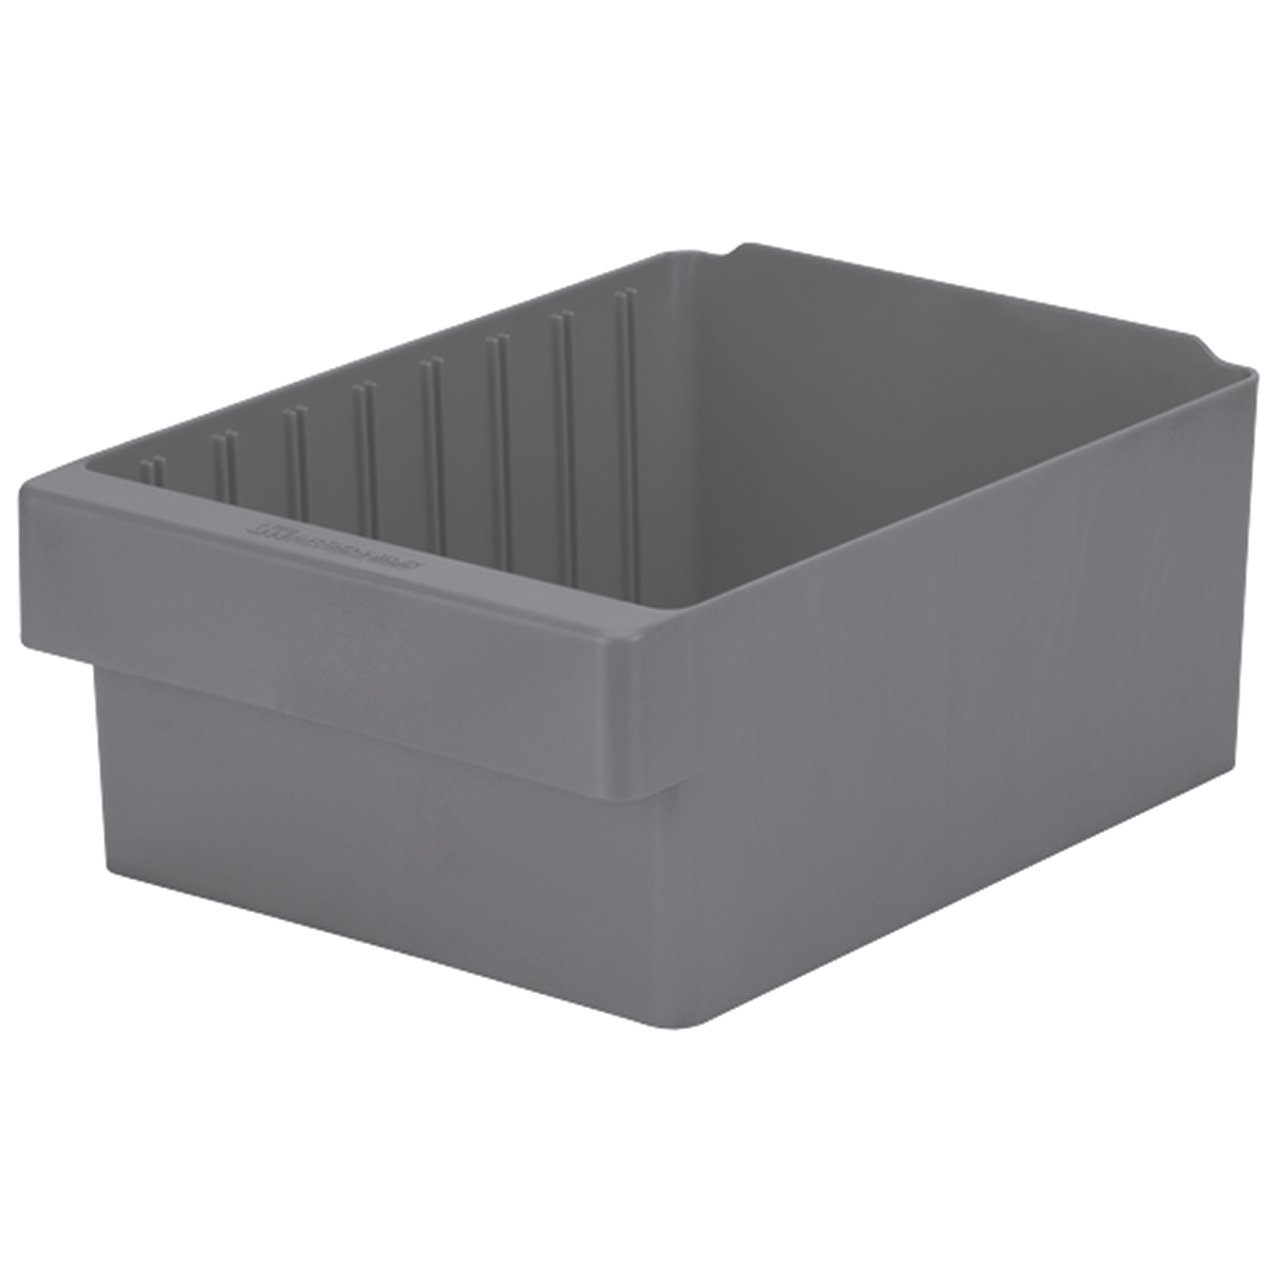 Akro-Mils 31188 AkroDrawer Plastic Storage Drawer, 17-5/8'' L x 8-3/8'' W x 4-5/8'' H, Grey, Case of 4